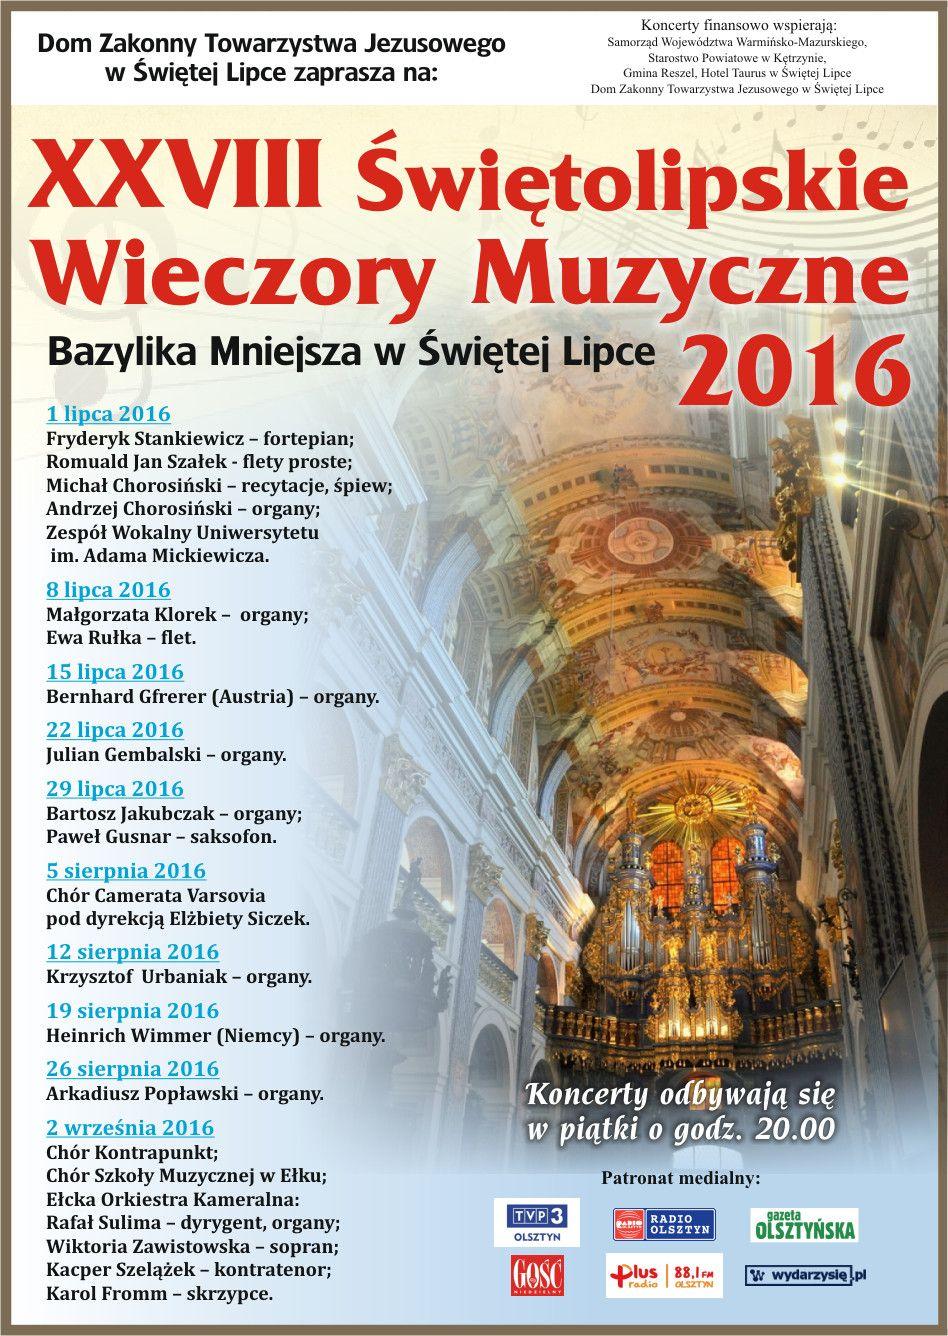 http://m.wm.pl/2016/07/orig/plakat-28-1-323968.jpg